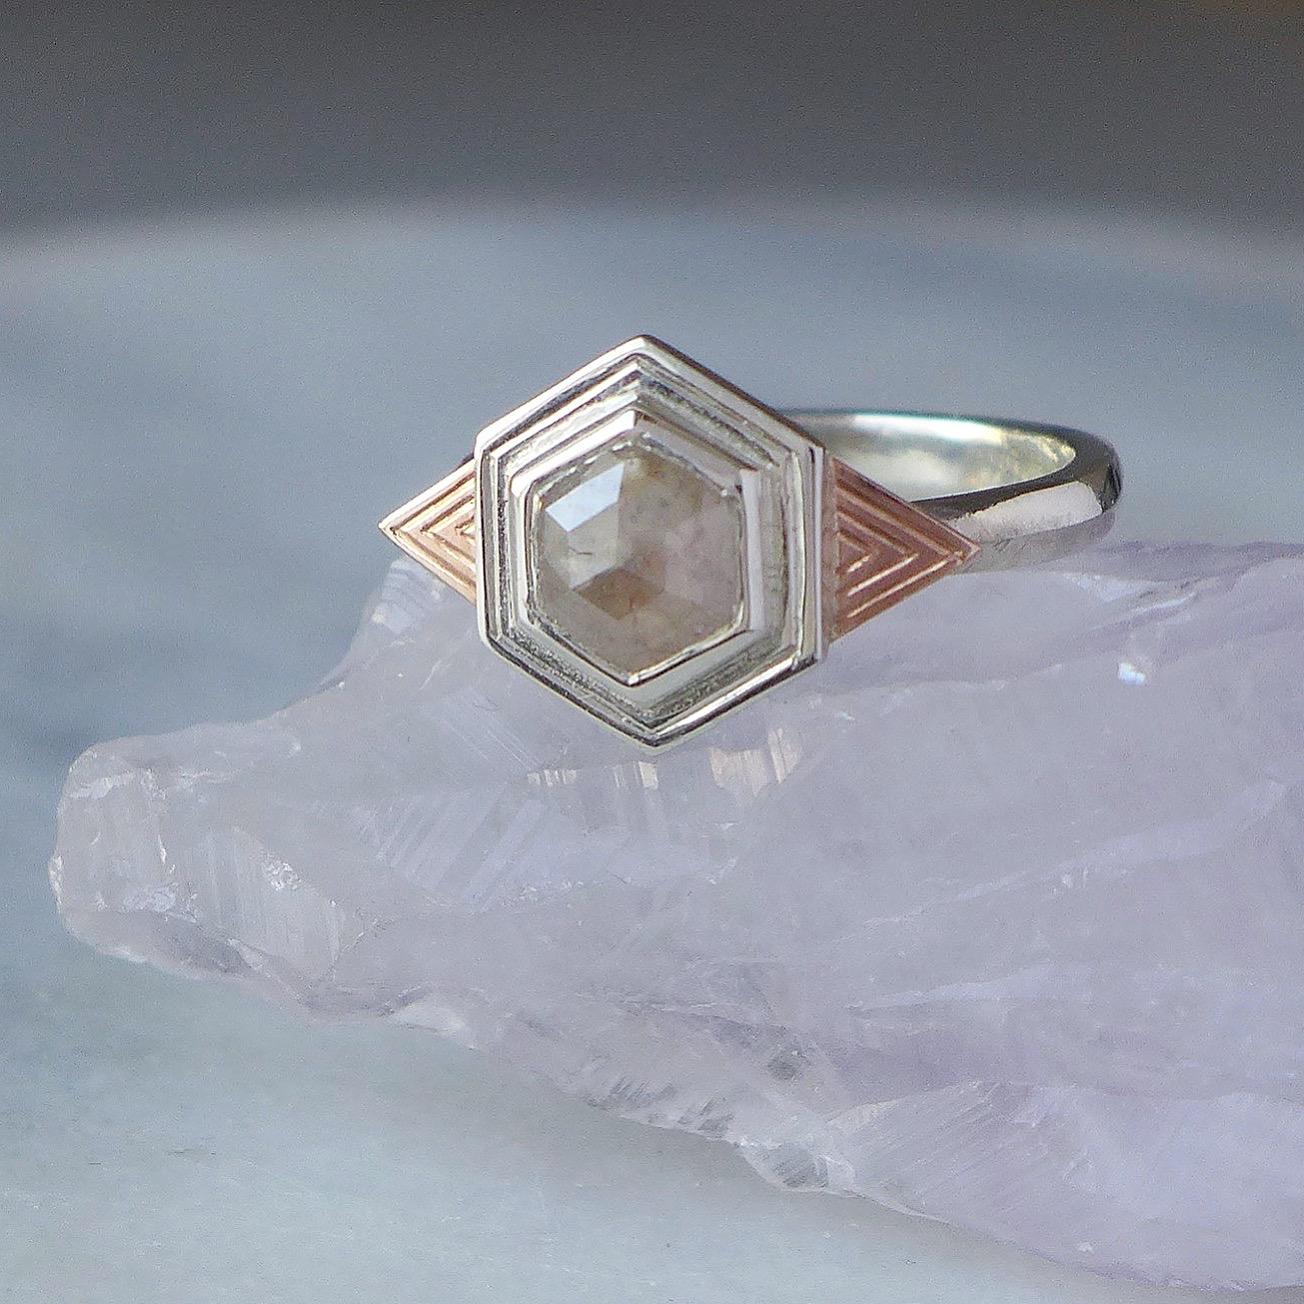 daniel darby - - jewellery -